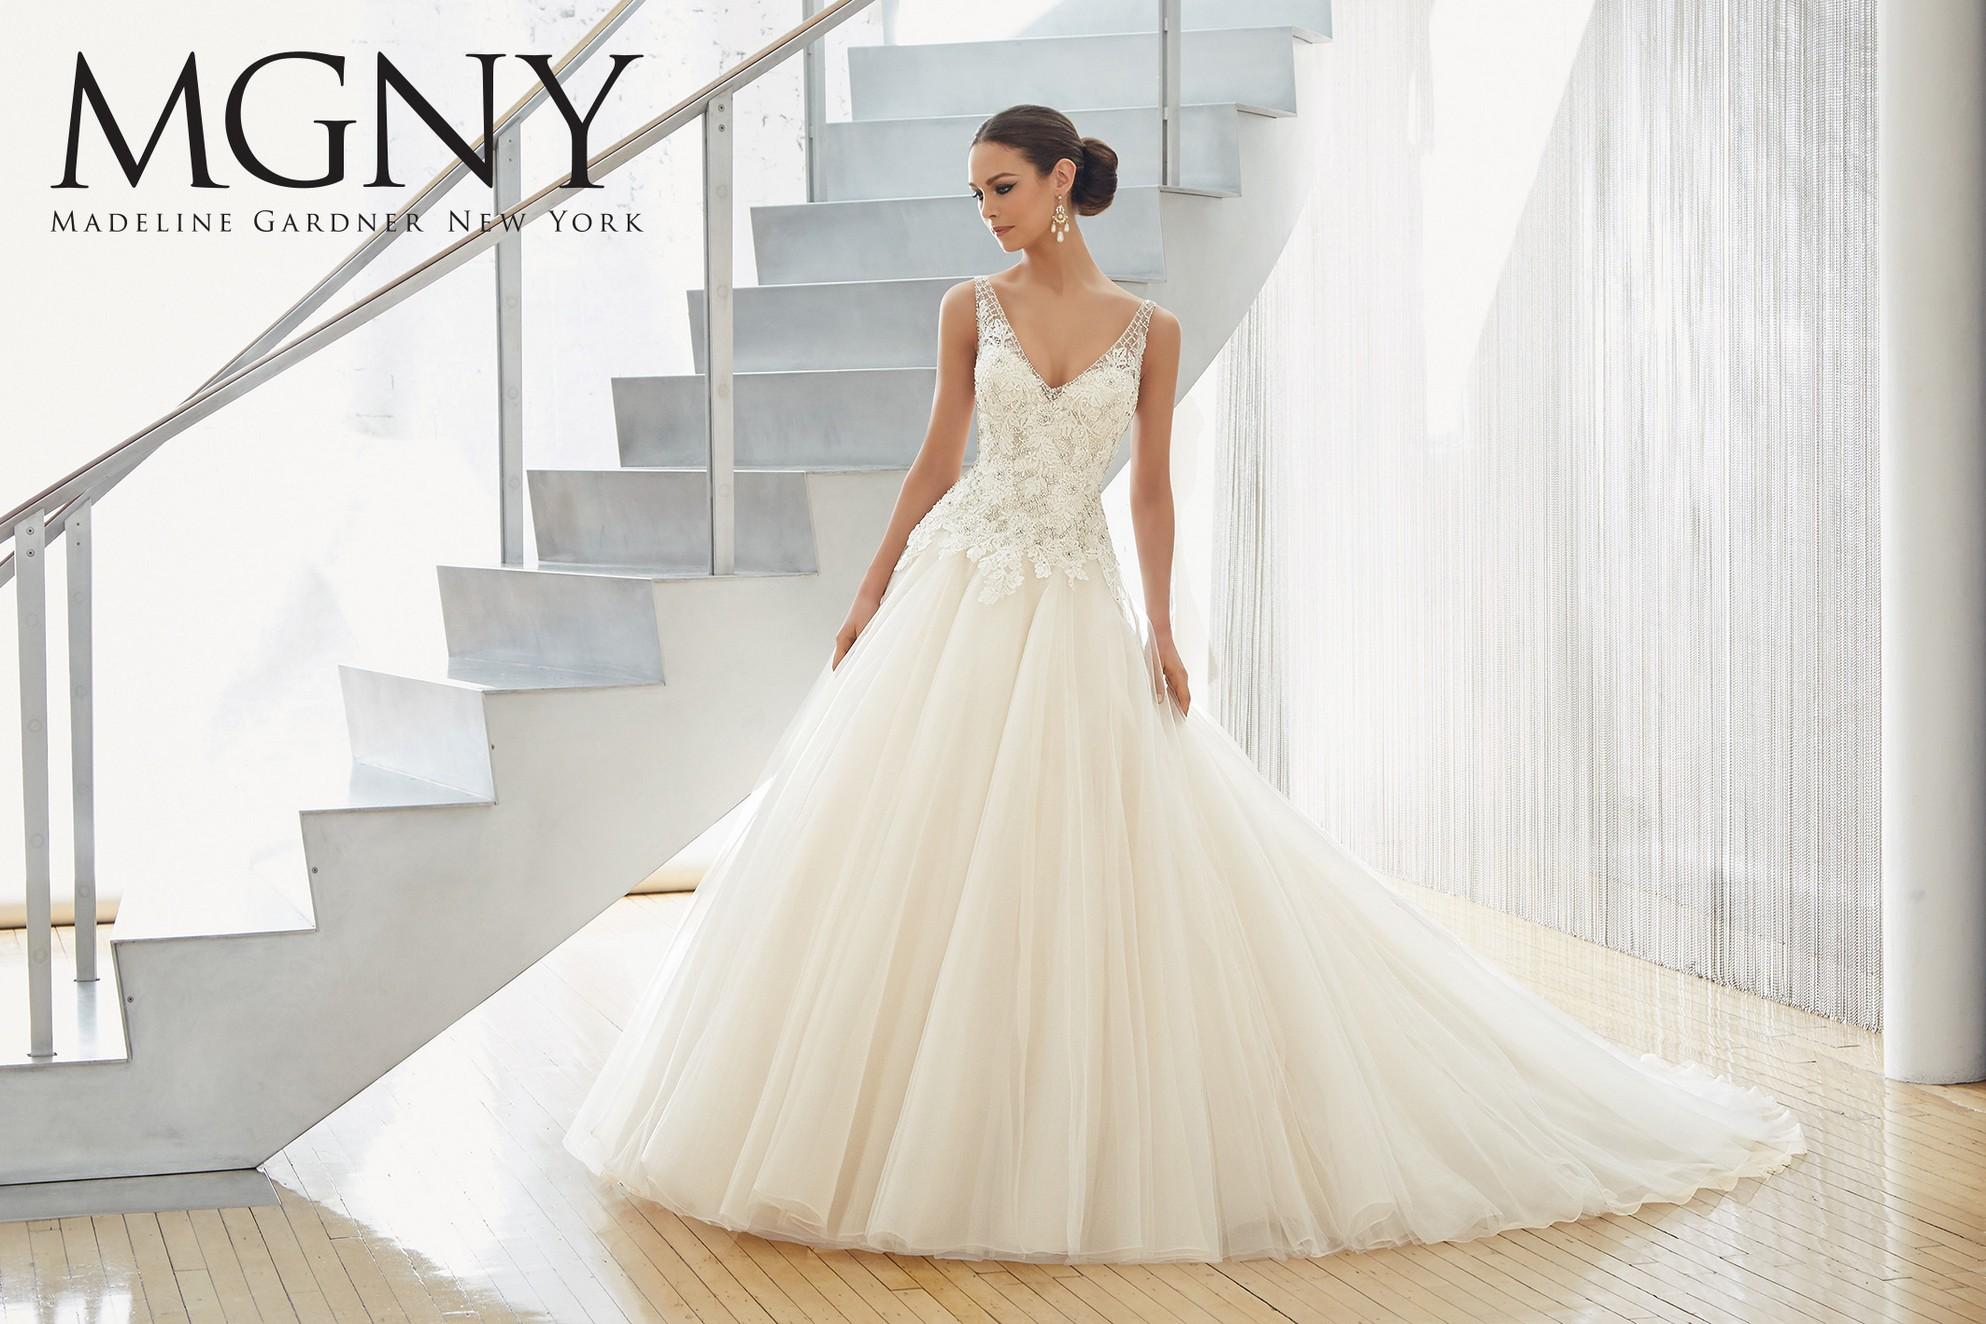 Off The Peg Bridesmaid Dresses - Discount Wedding Dresses